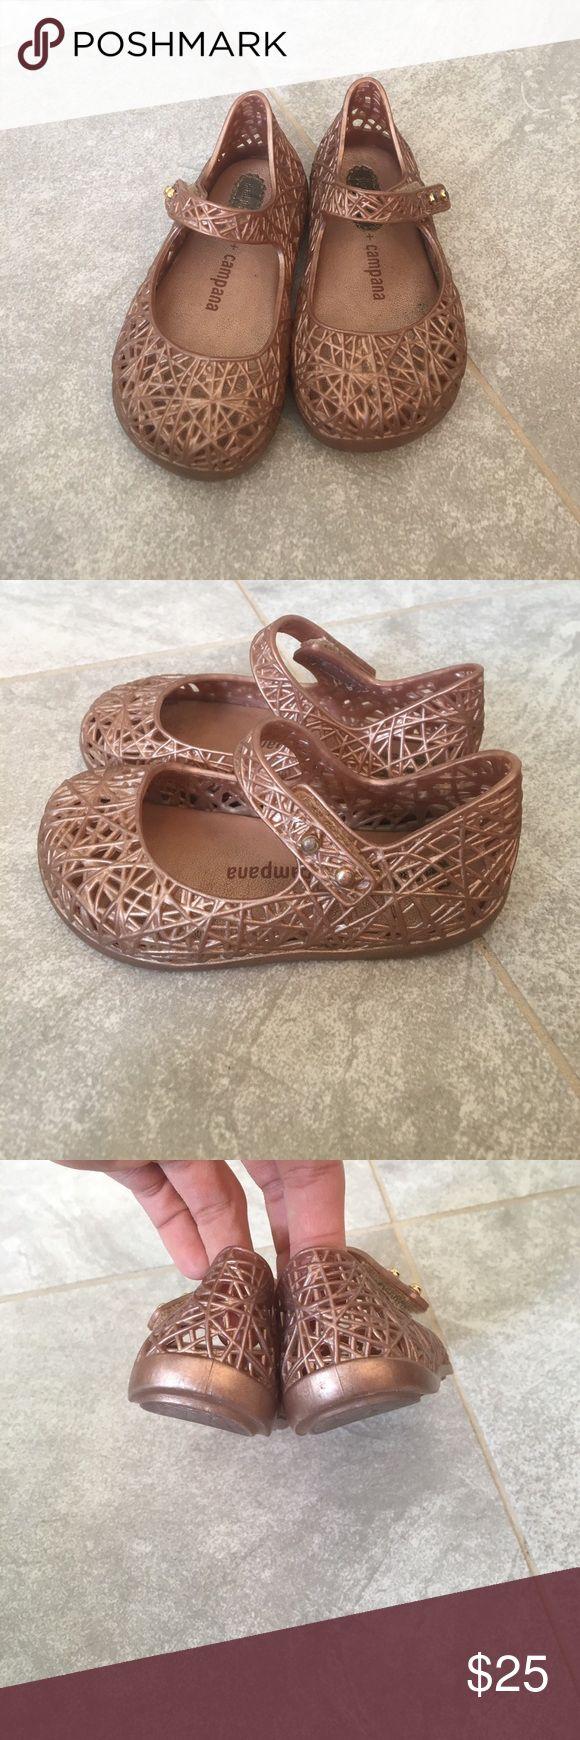 Mini Melissa pink shoes size 6 Mini Melissa pink shoes size 6! Mini Melissa Shoes Slippers